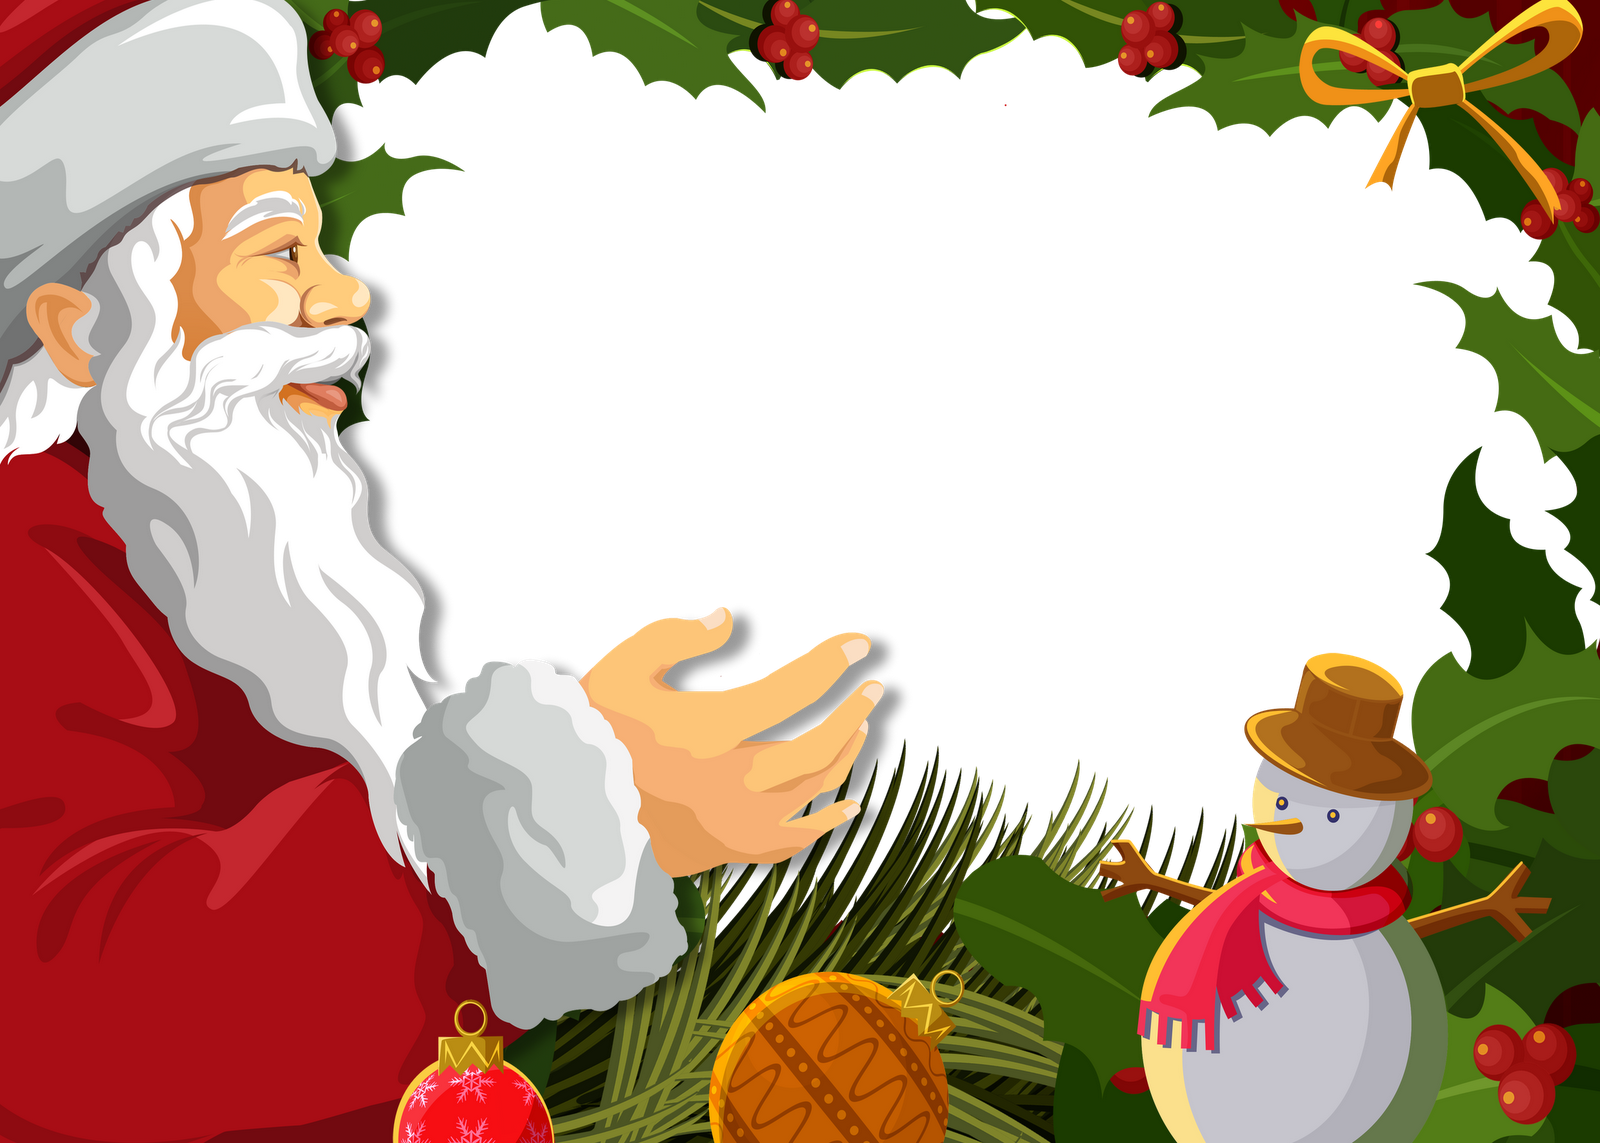 Montajes De Navidad Para Fotos Gratis